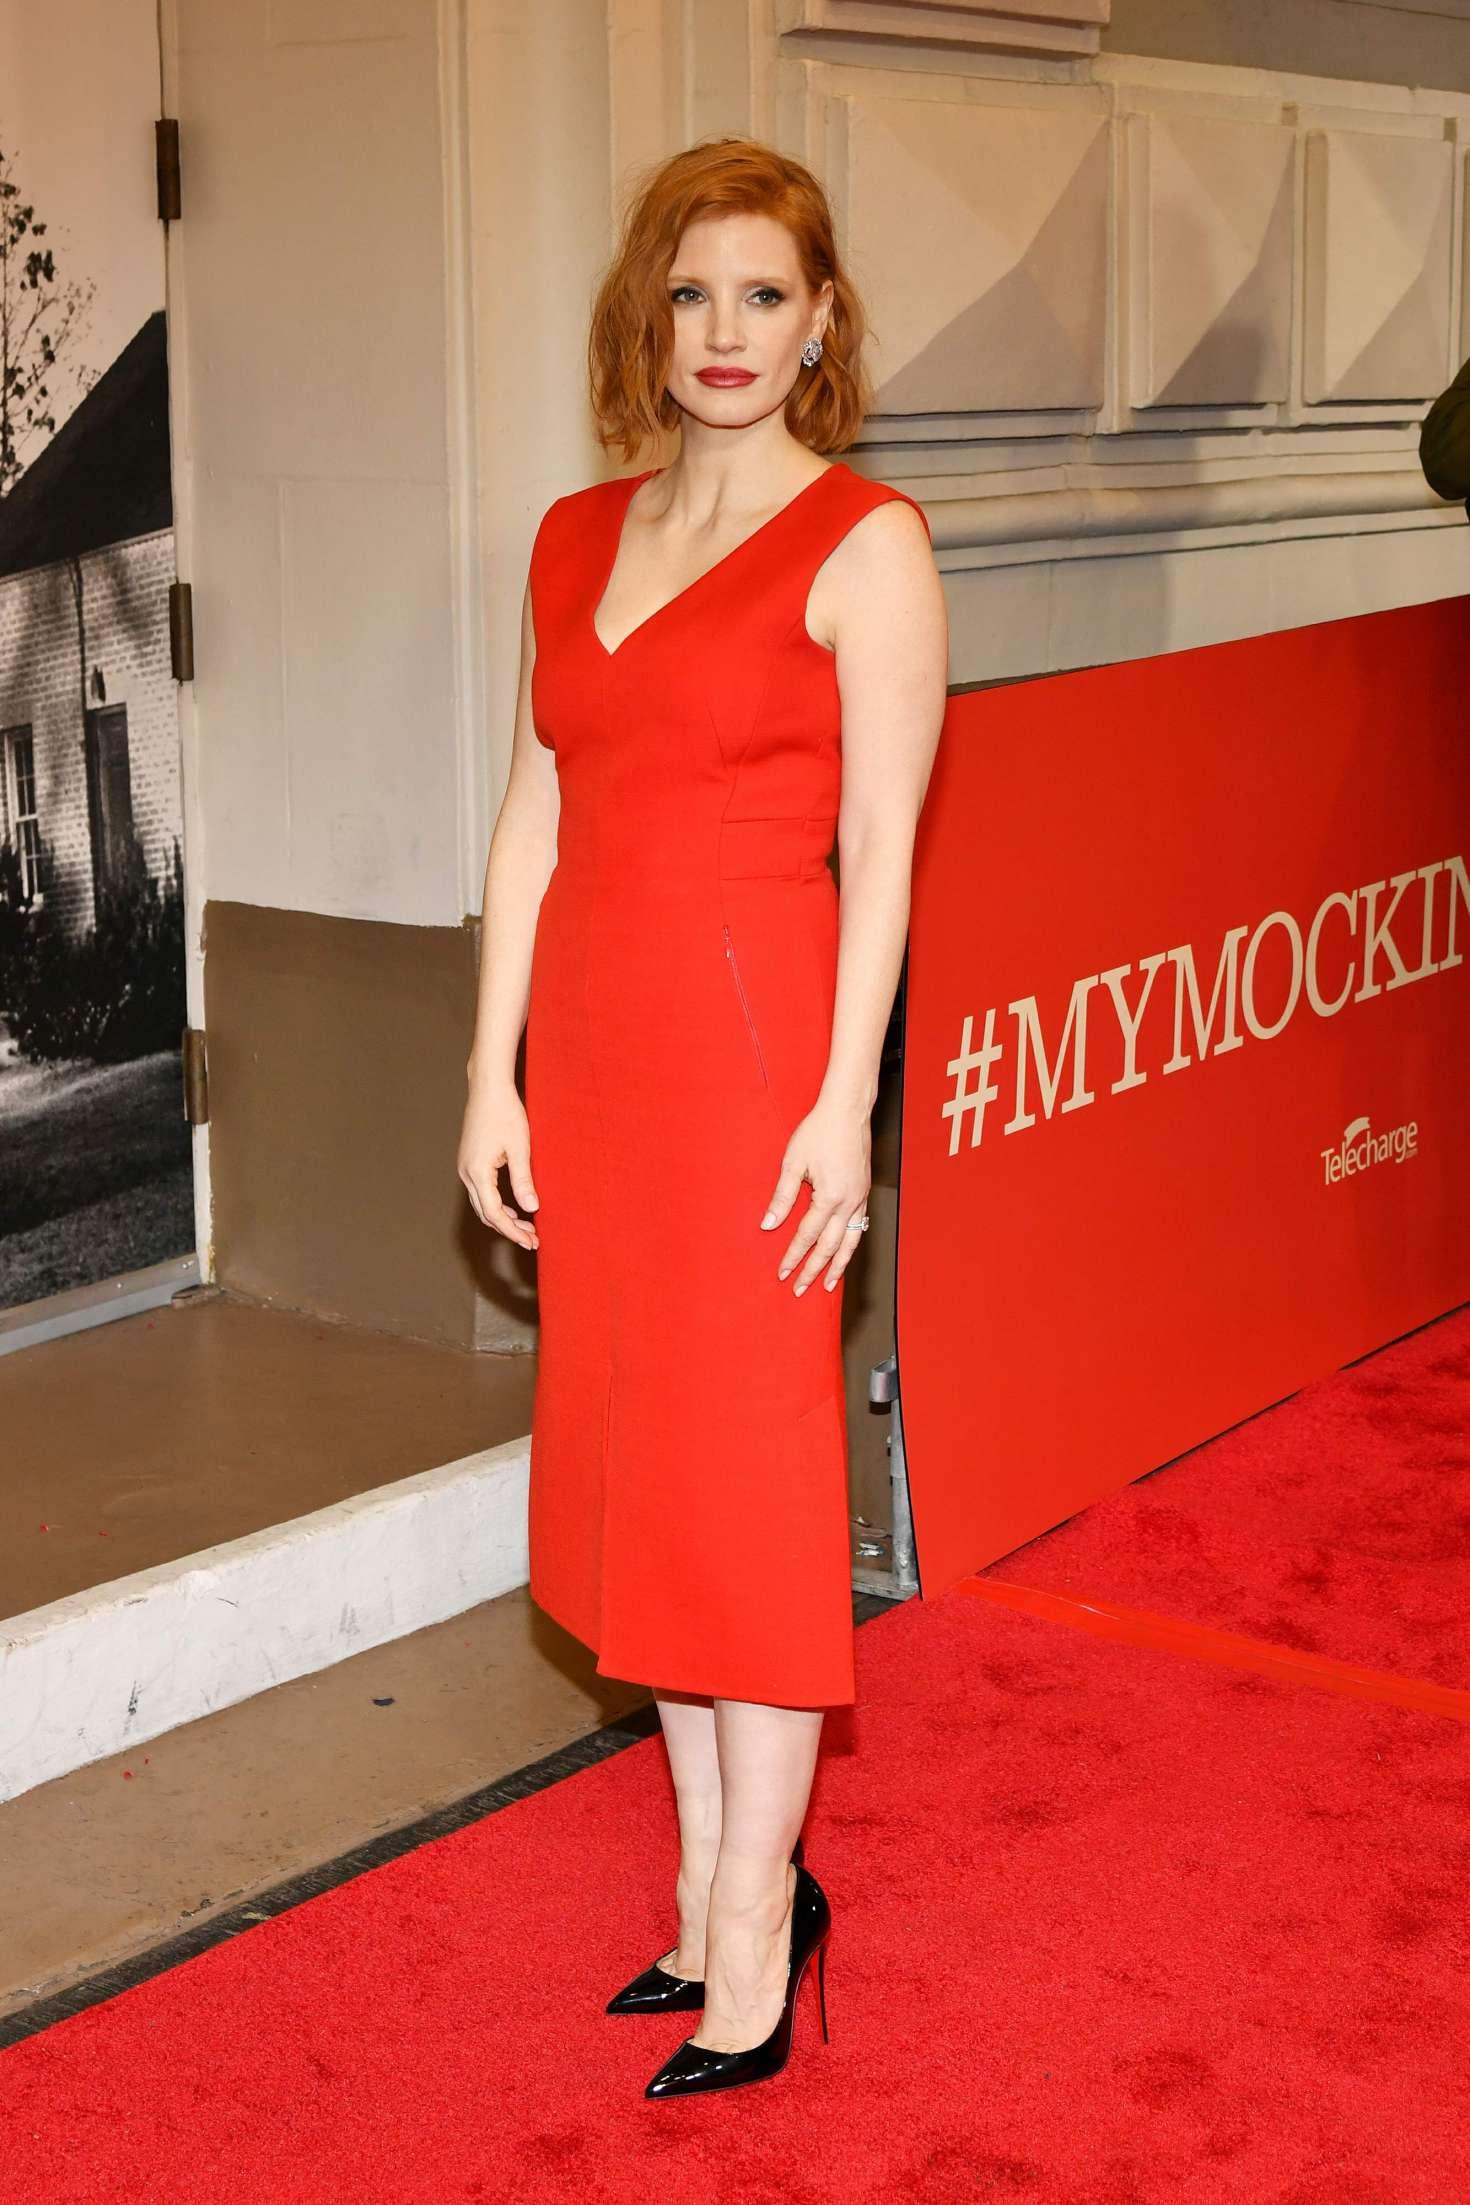 Jessica Chastain 2018 : Jessica Chastain: To Kill A Mockingbird Opening Night -08